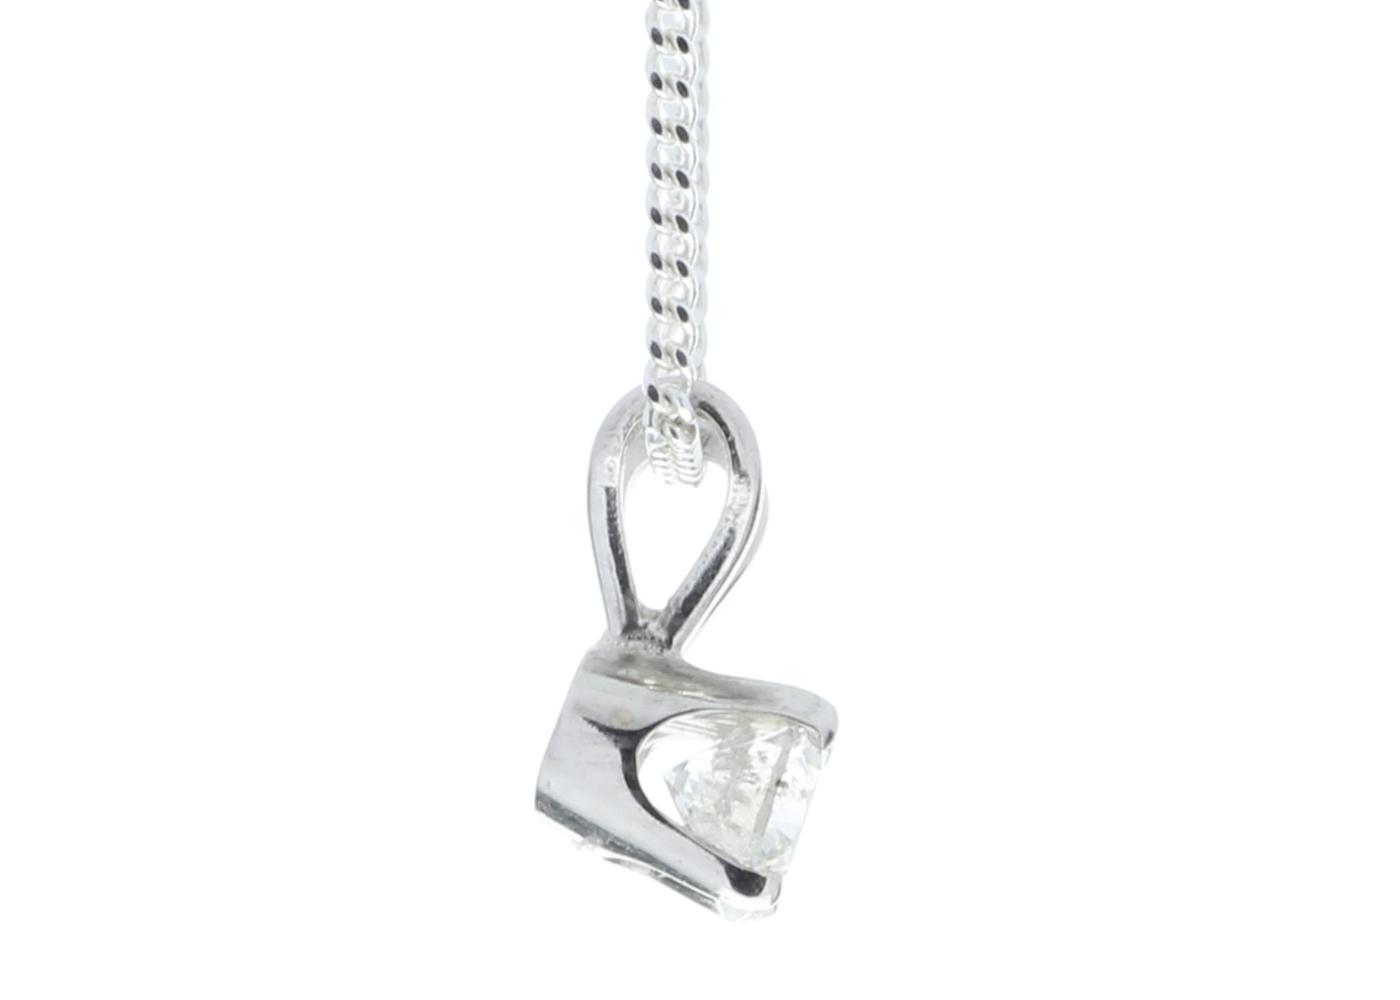 9ct White Gold Single Stone Claw Set Diamond Pendant 0.20 Carats - Image 3 of 5